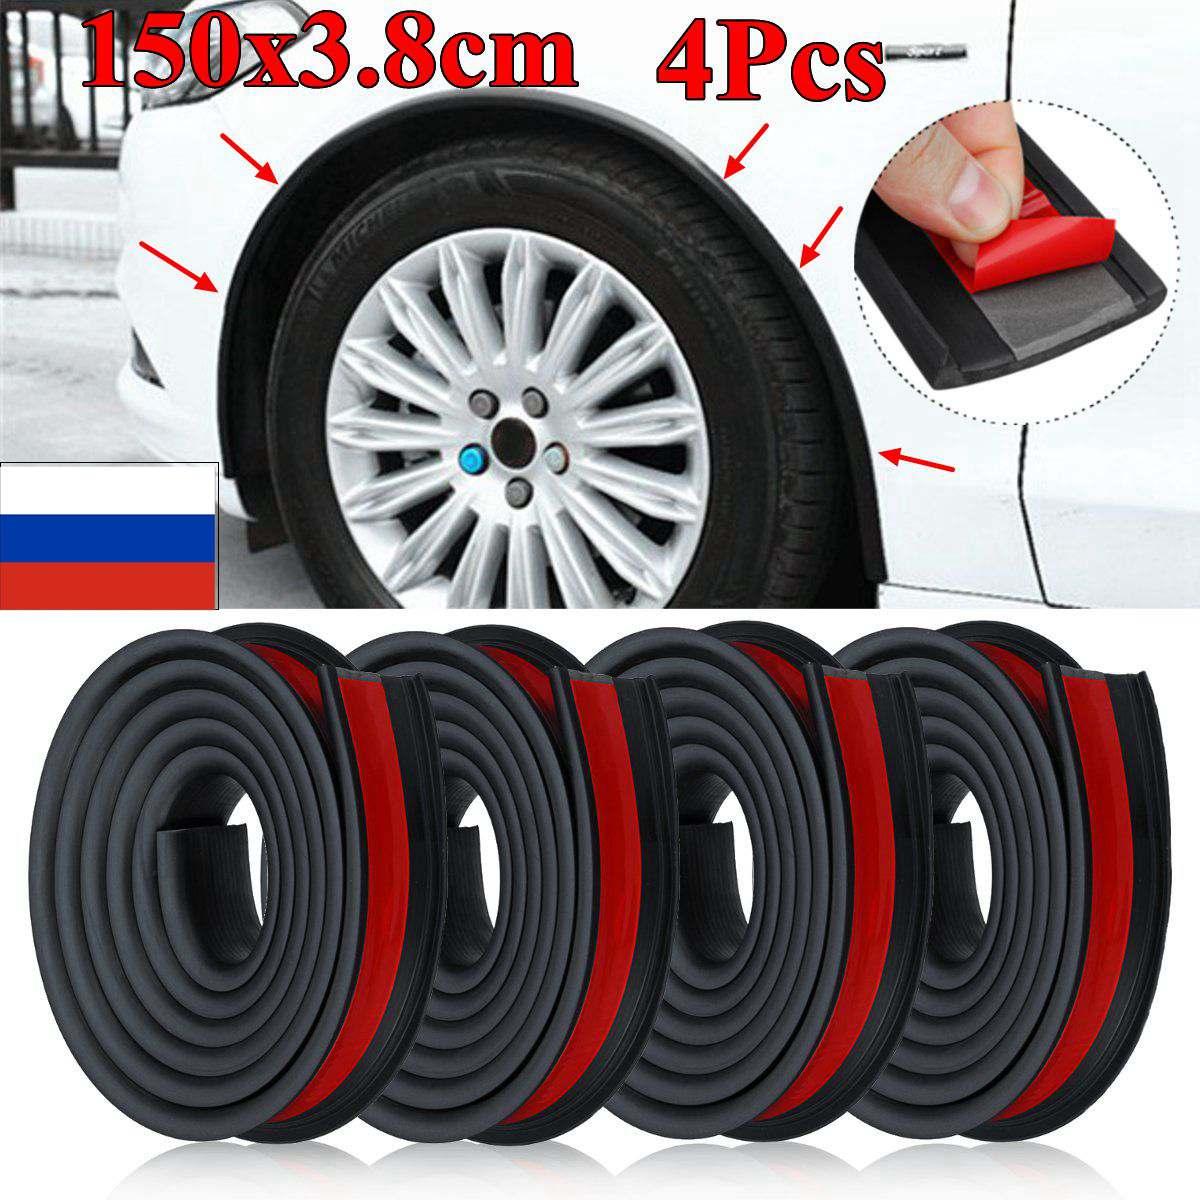 4pcs 1.5M x 3.8CM Universele Rubber Auto Wheel Arch Bescherming Lijstwerk Anti-collision Spatbord Auto Wiel bescherming Wiel Sticker